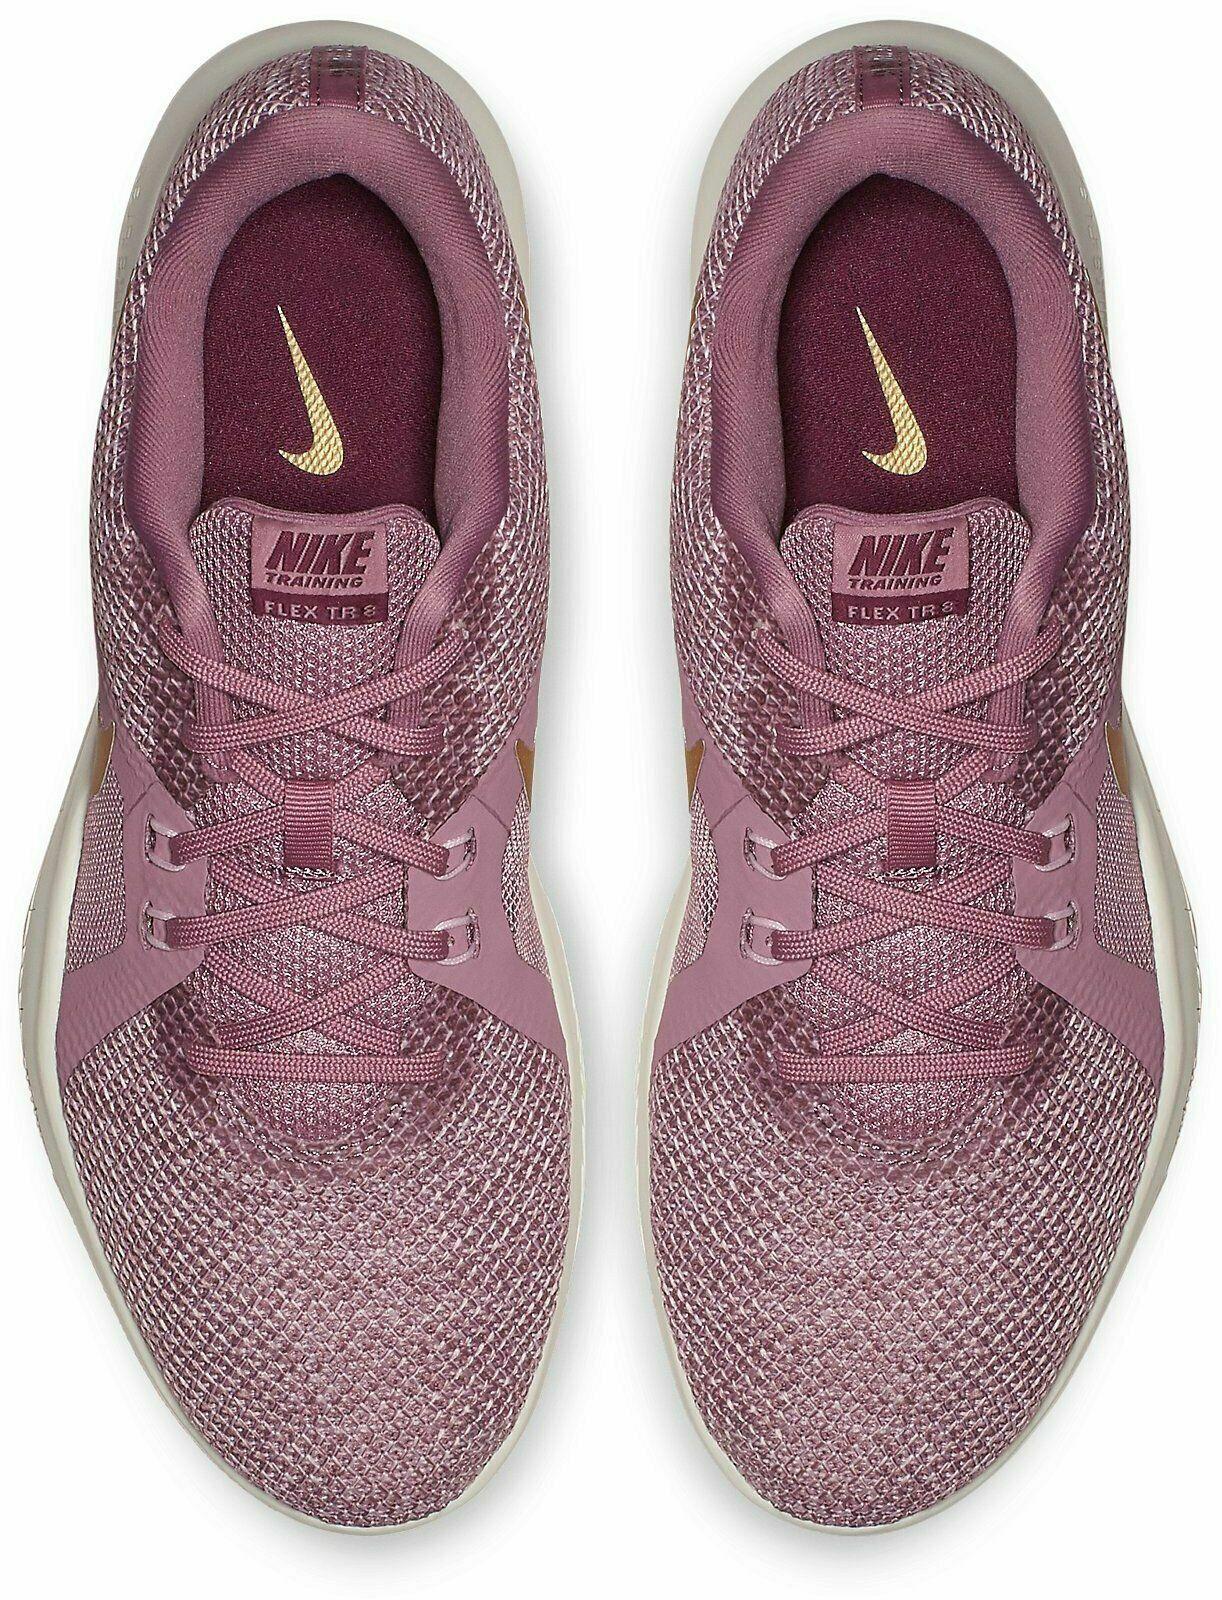 Nike Flex Trainer 8 Amp Training Shoes